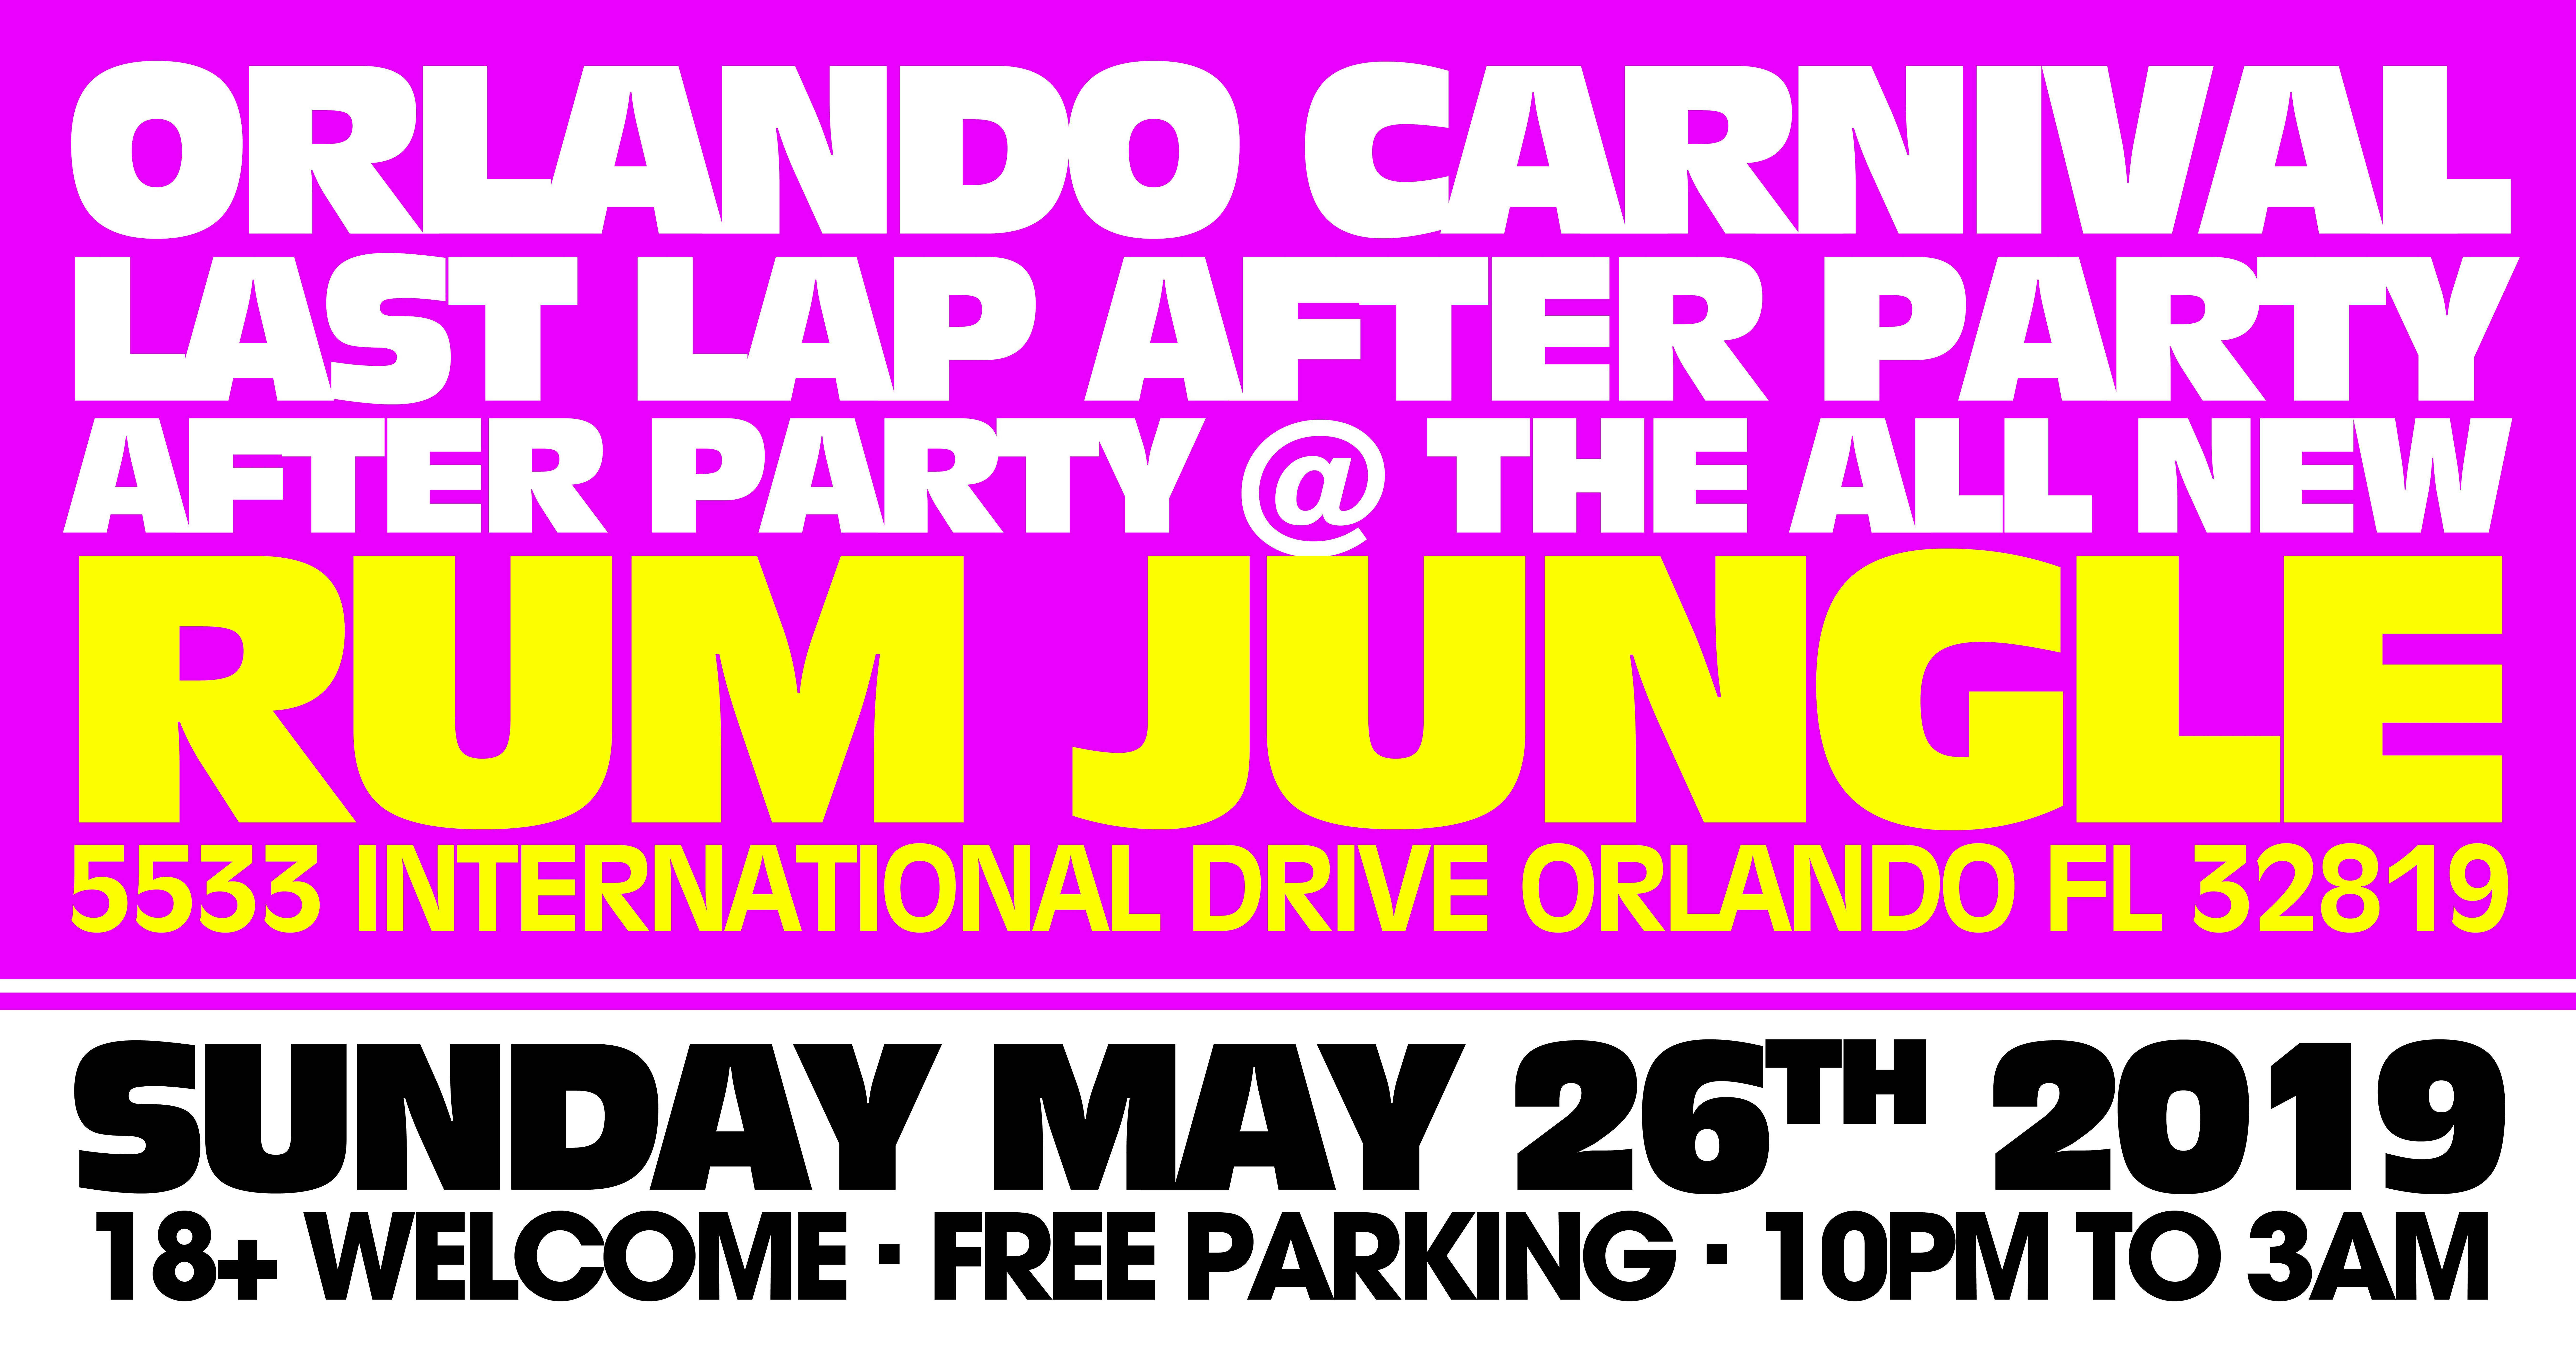 Orlando Carnival International Last Lap